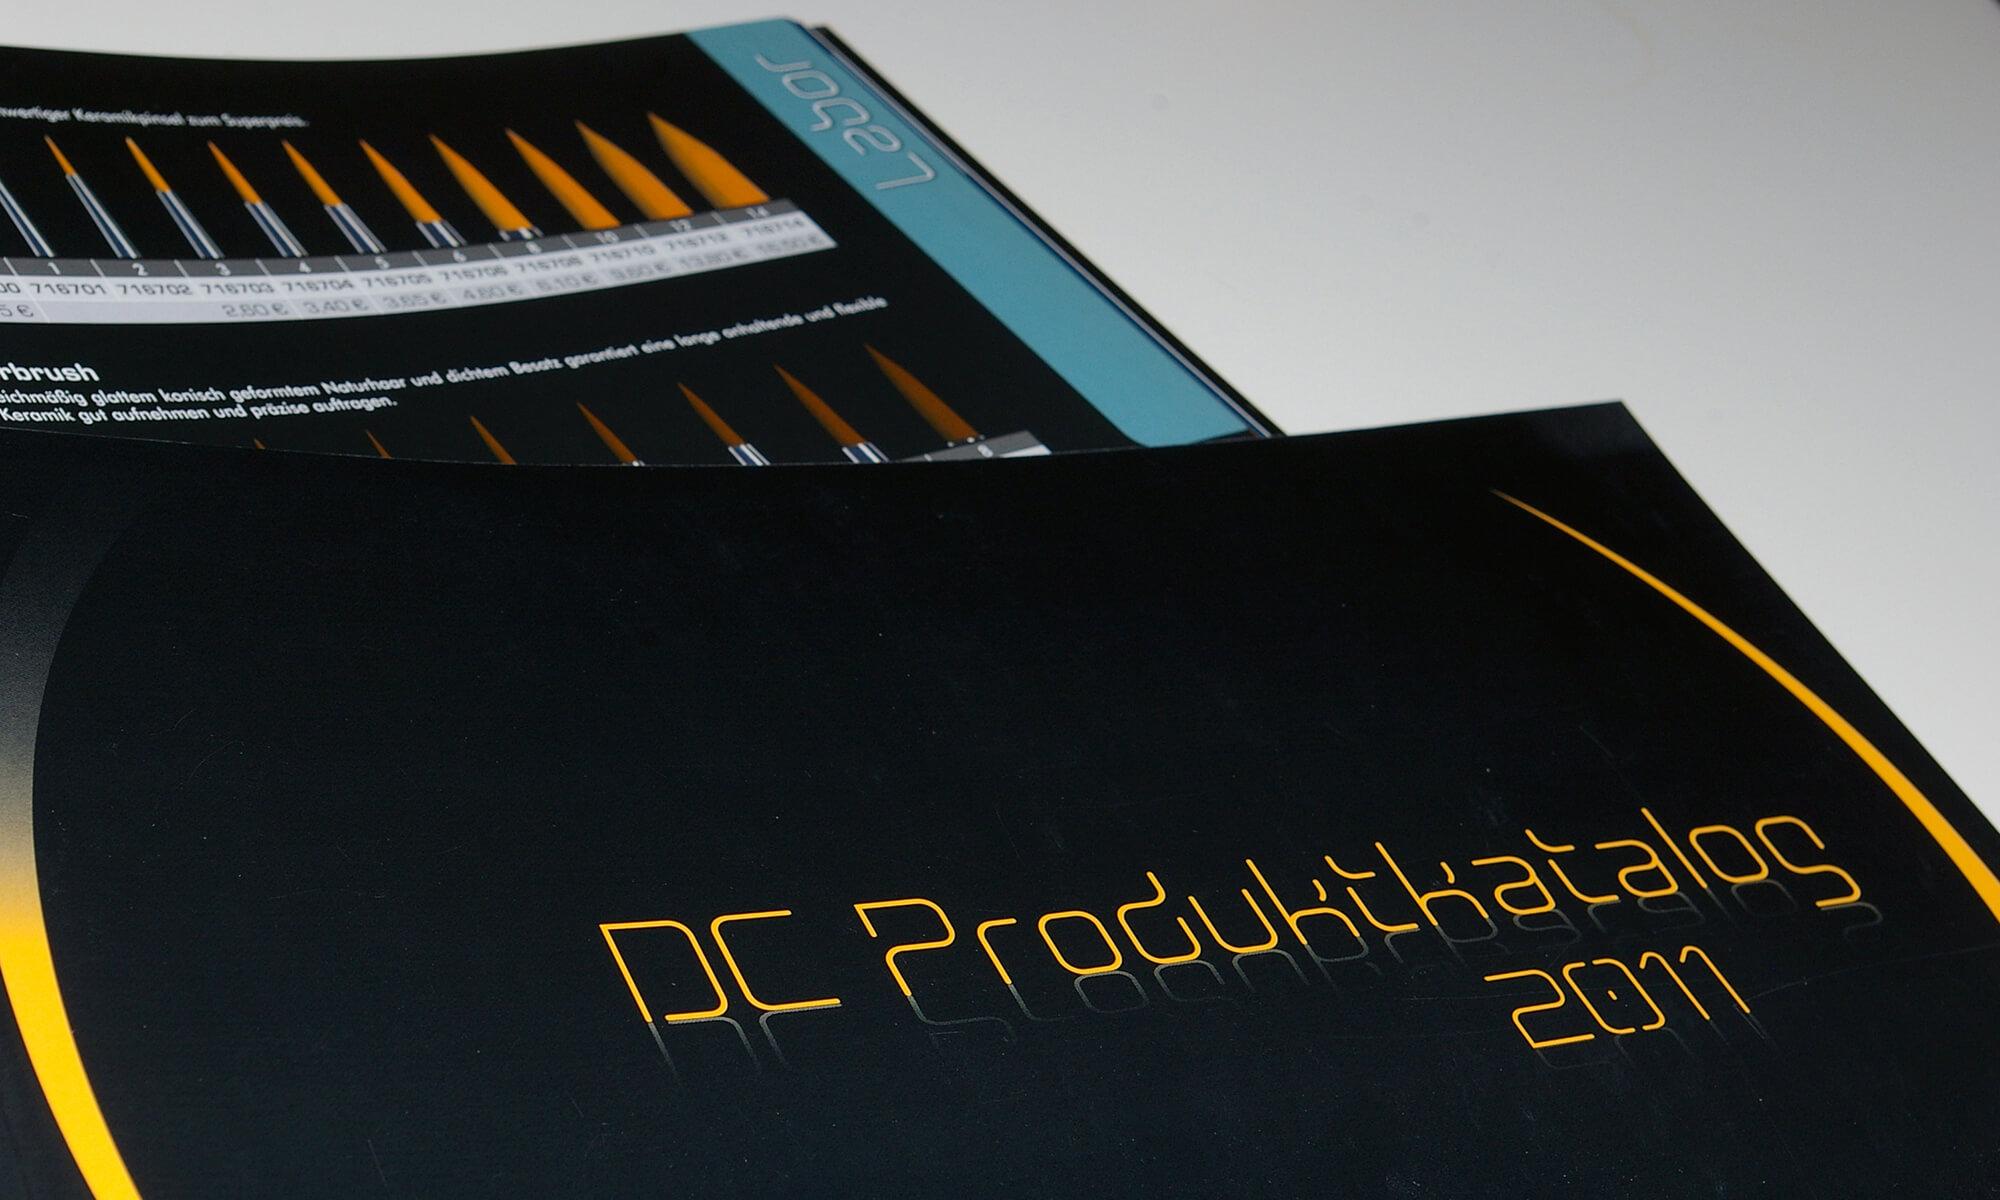 DC Dental Central - Produktkatalog